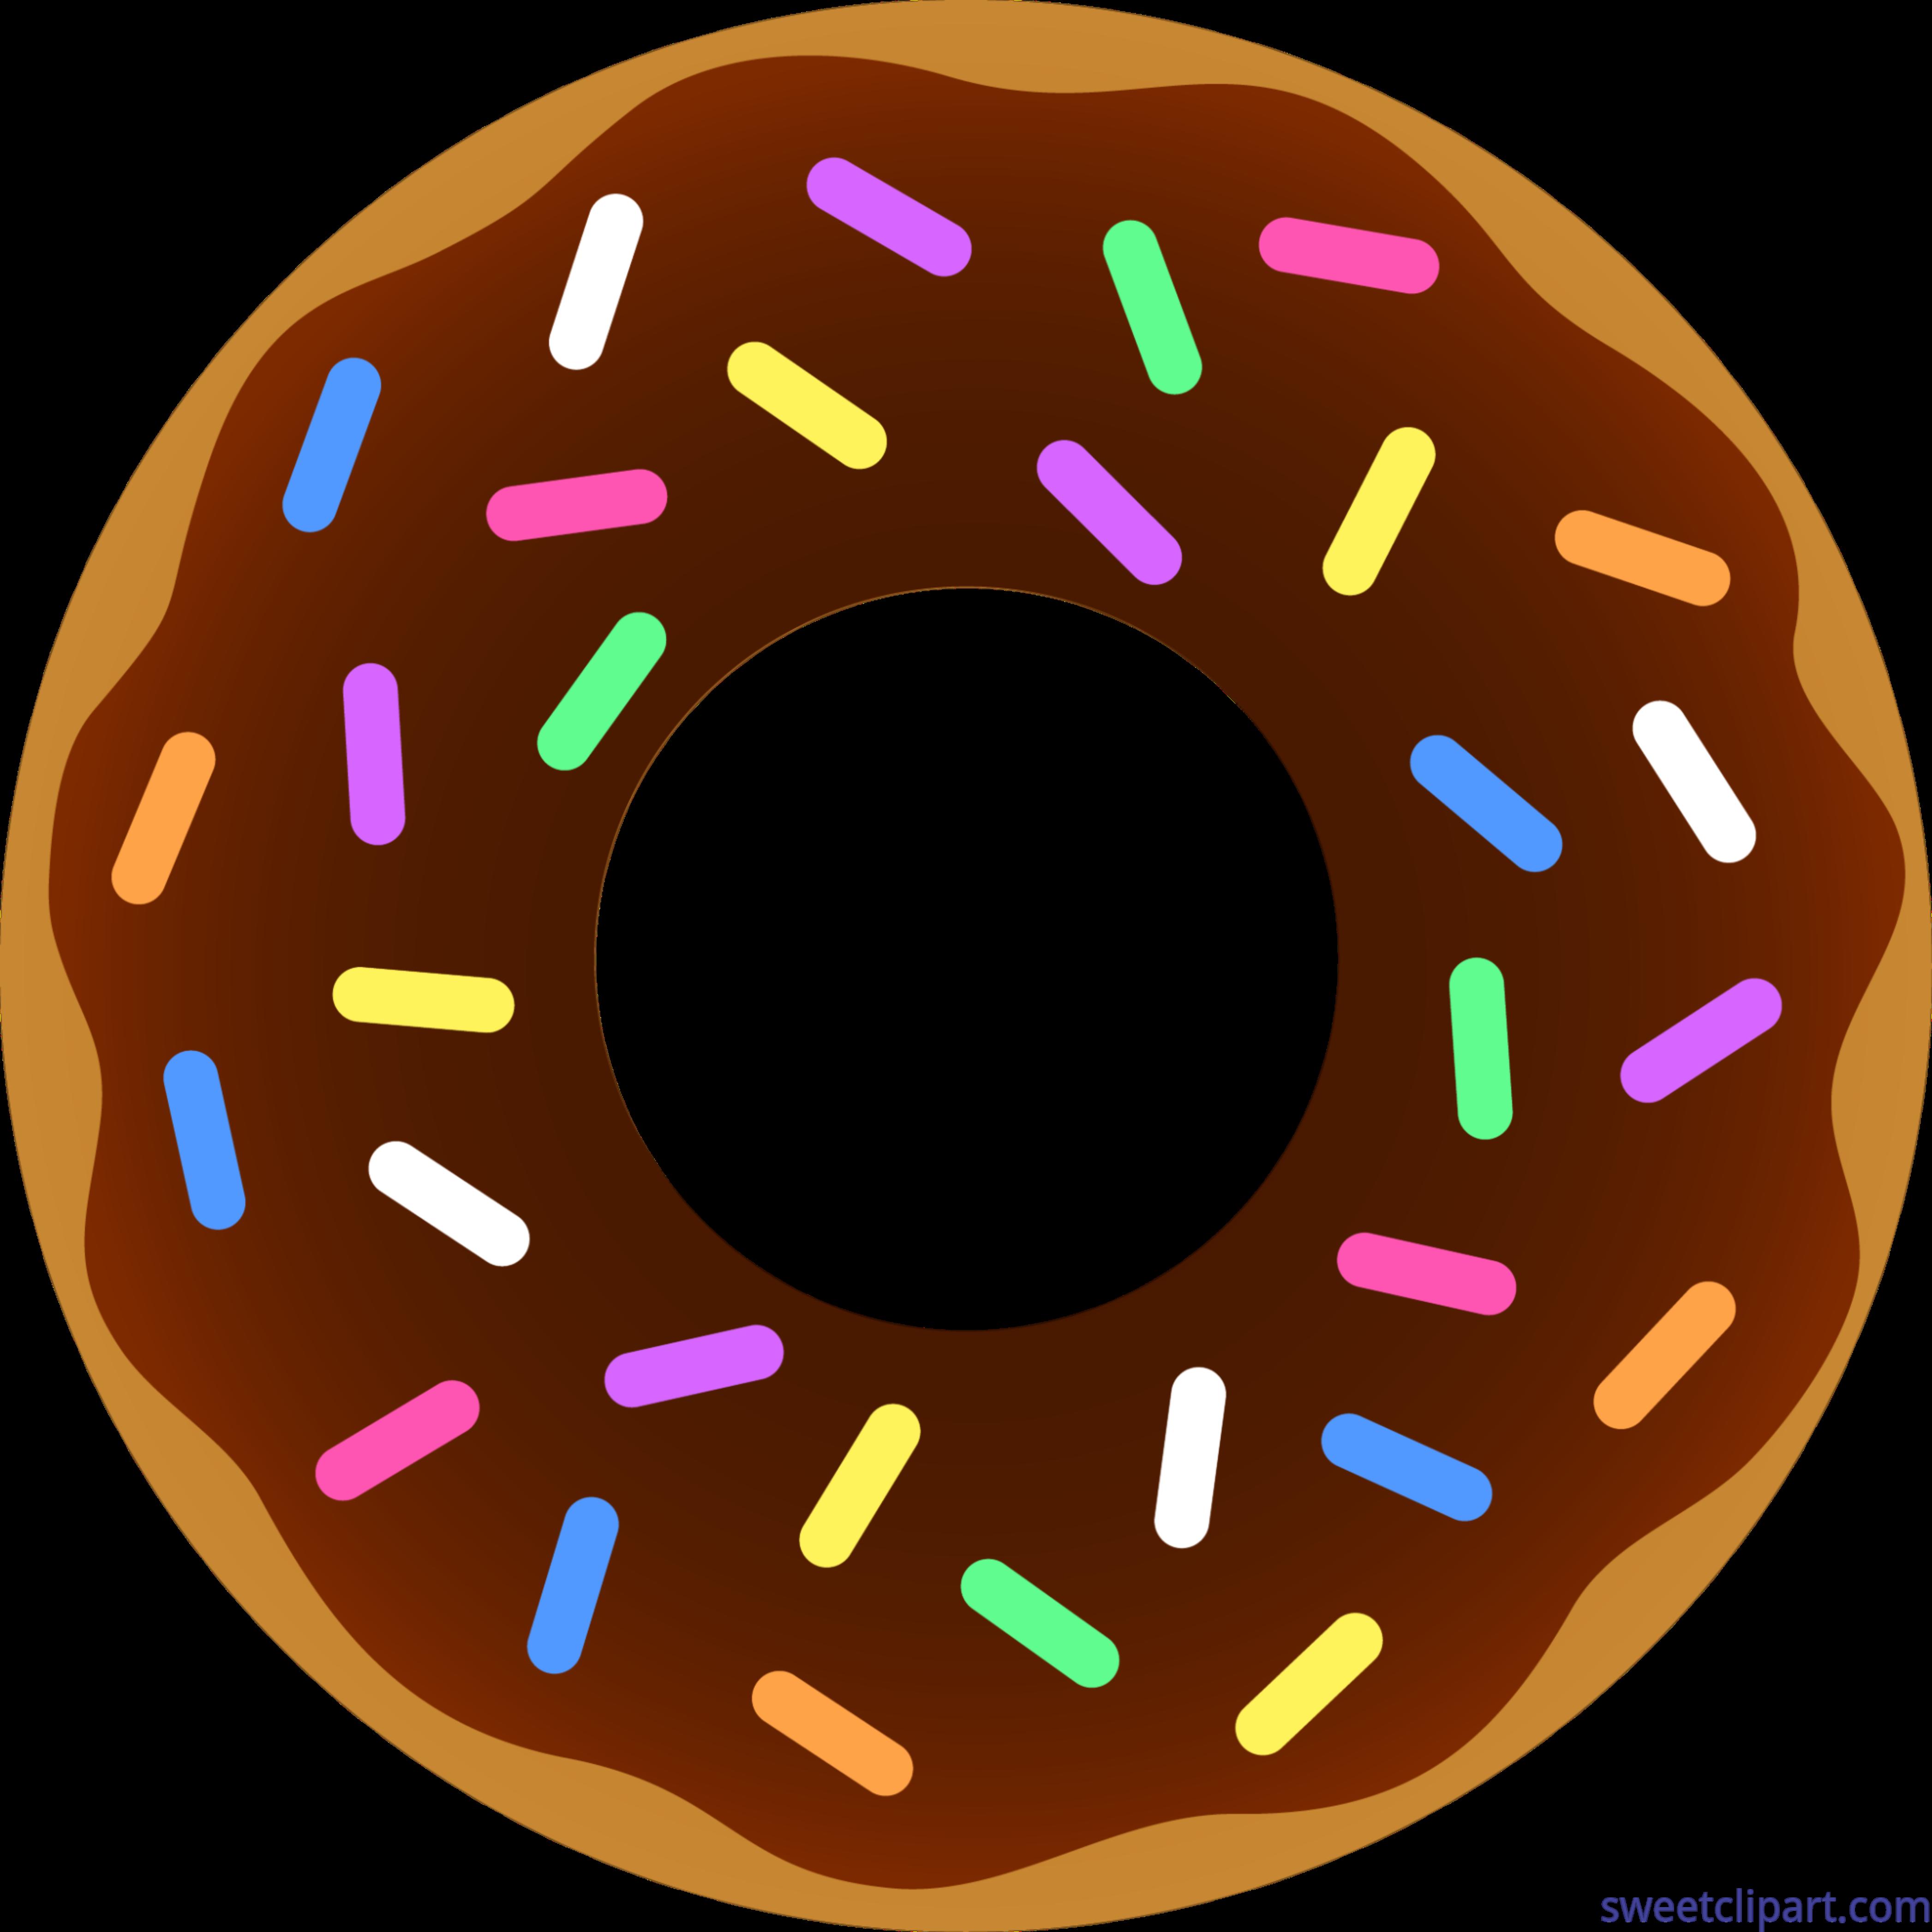 Donut clipart circle. Chocolate sprinkles clip art